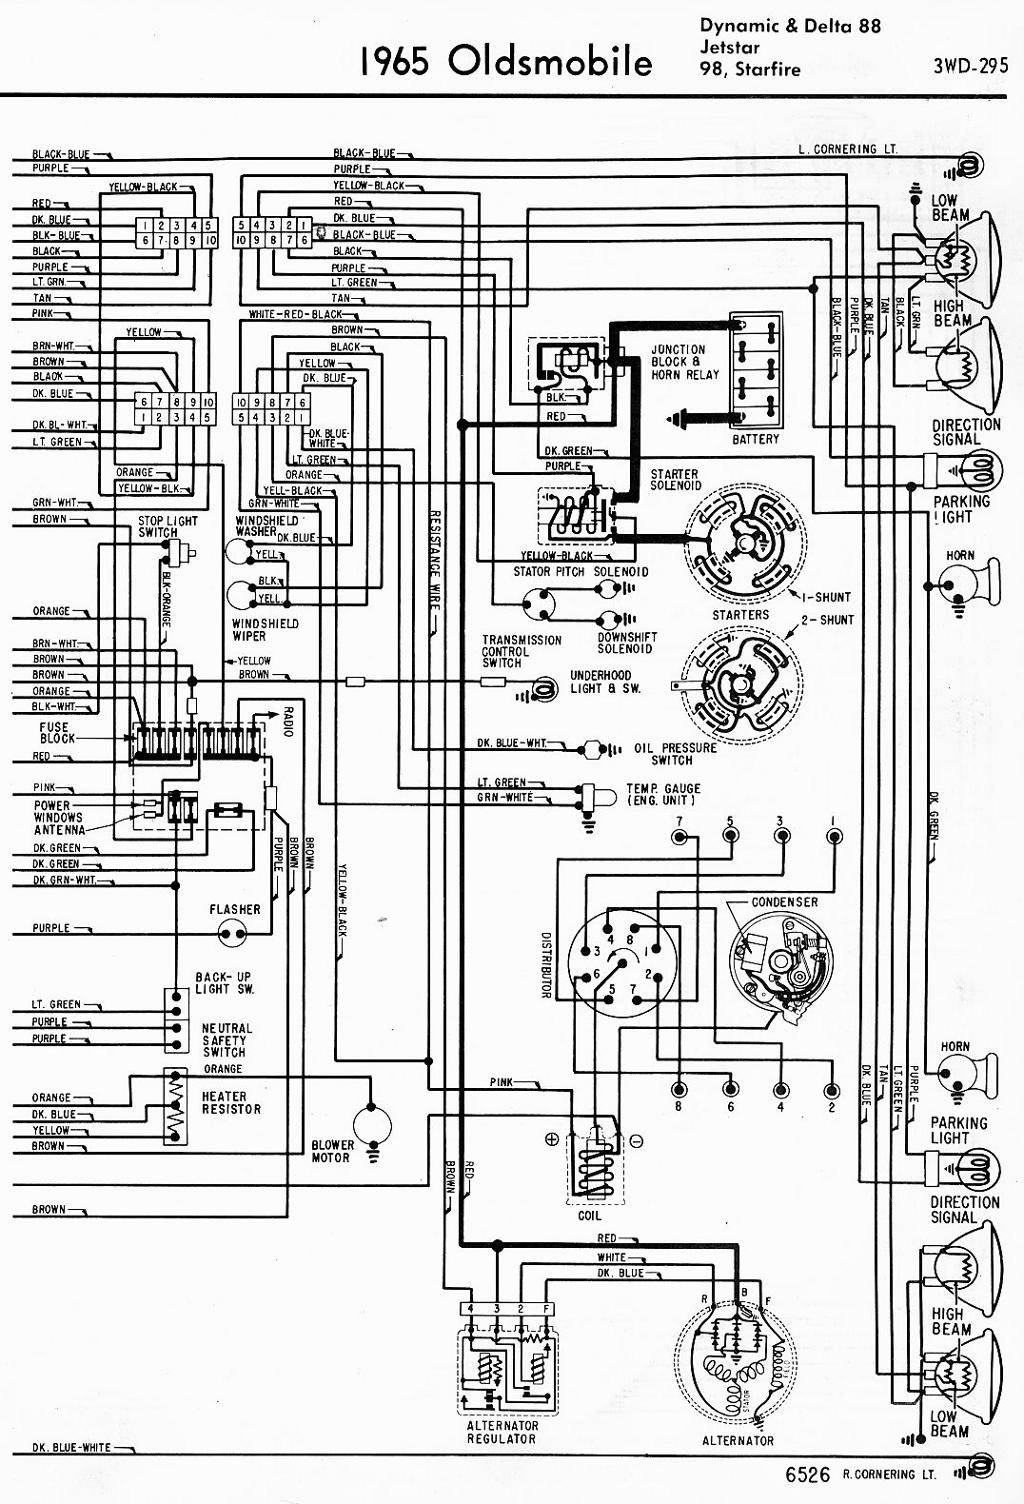 Wiring Diagram Nissan Tiida Simple Dodge Caliber Diagrams Air Con Blog